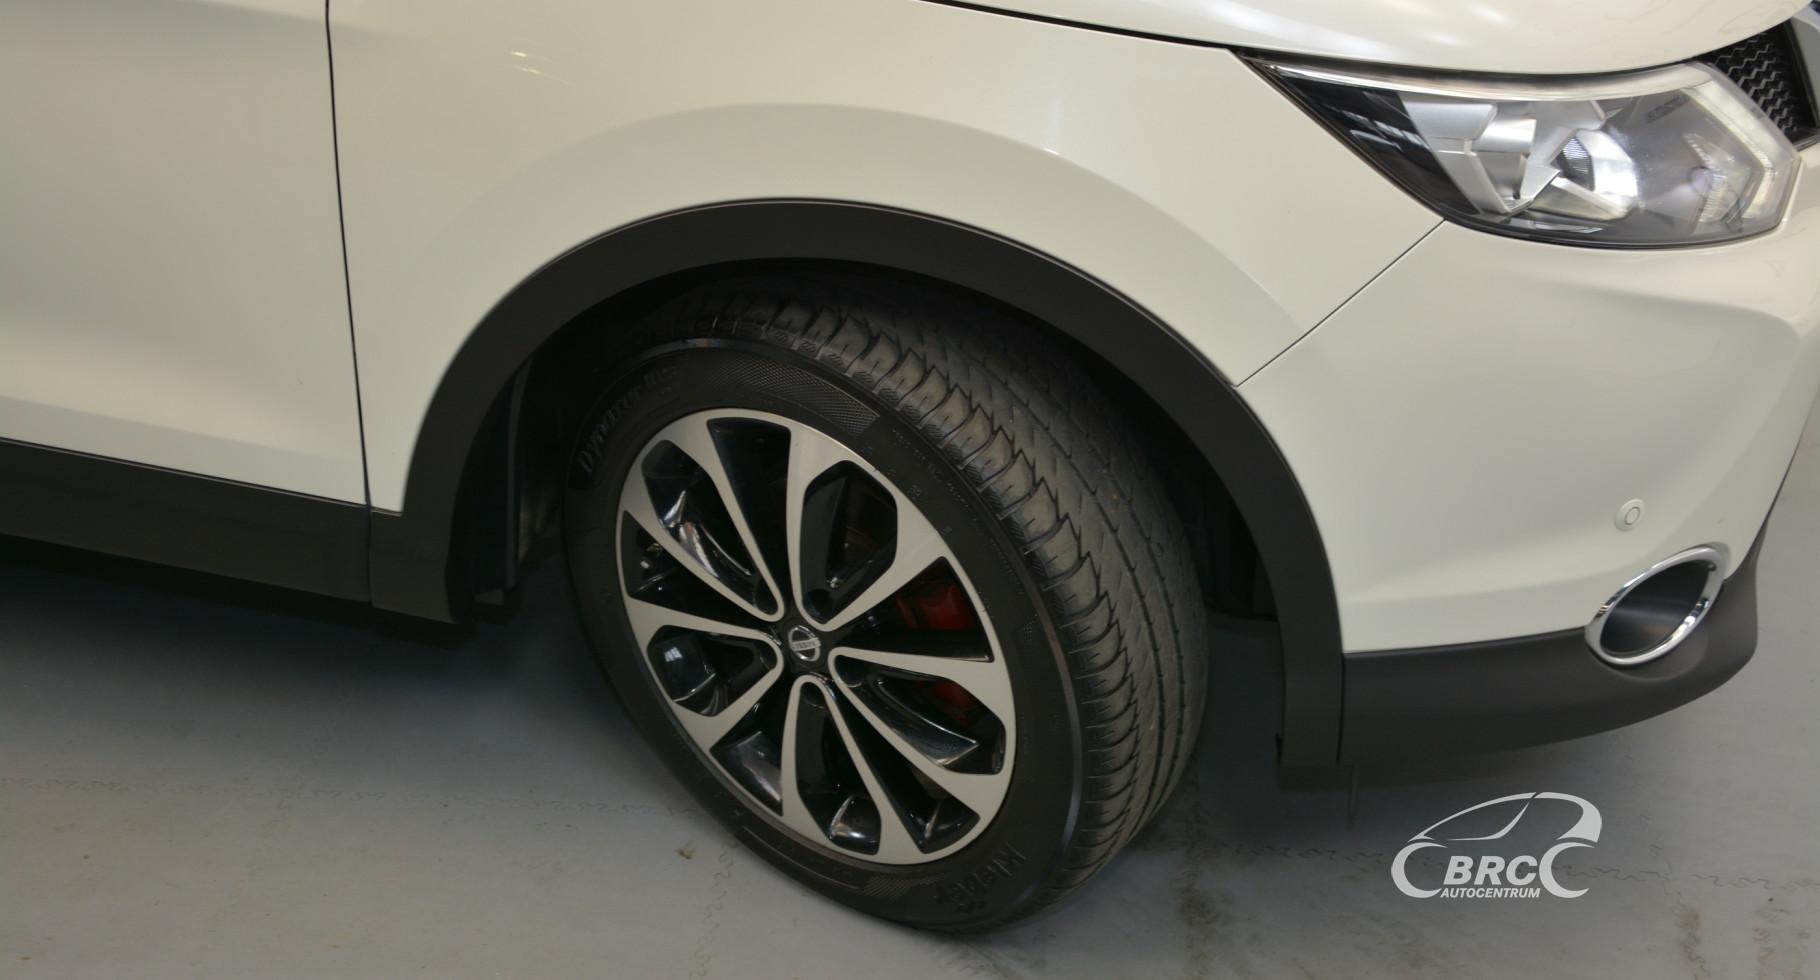 Nissan Qashqai 1.6 dCi FWD Automatas